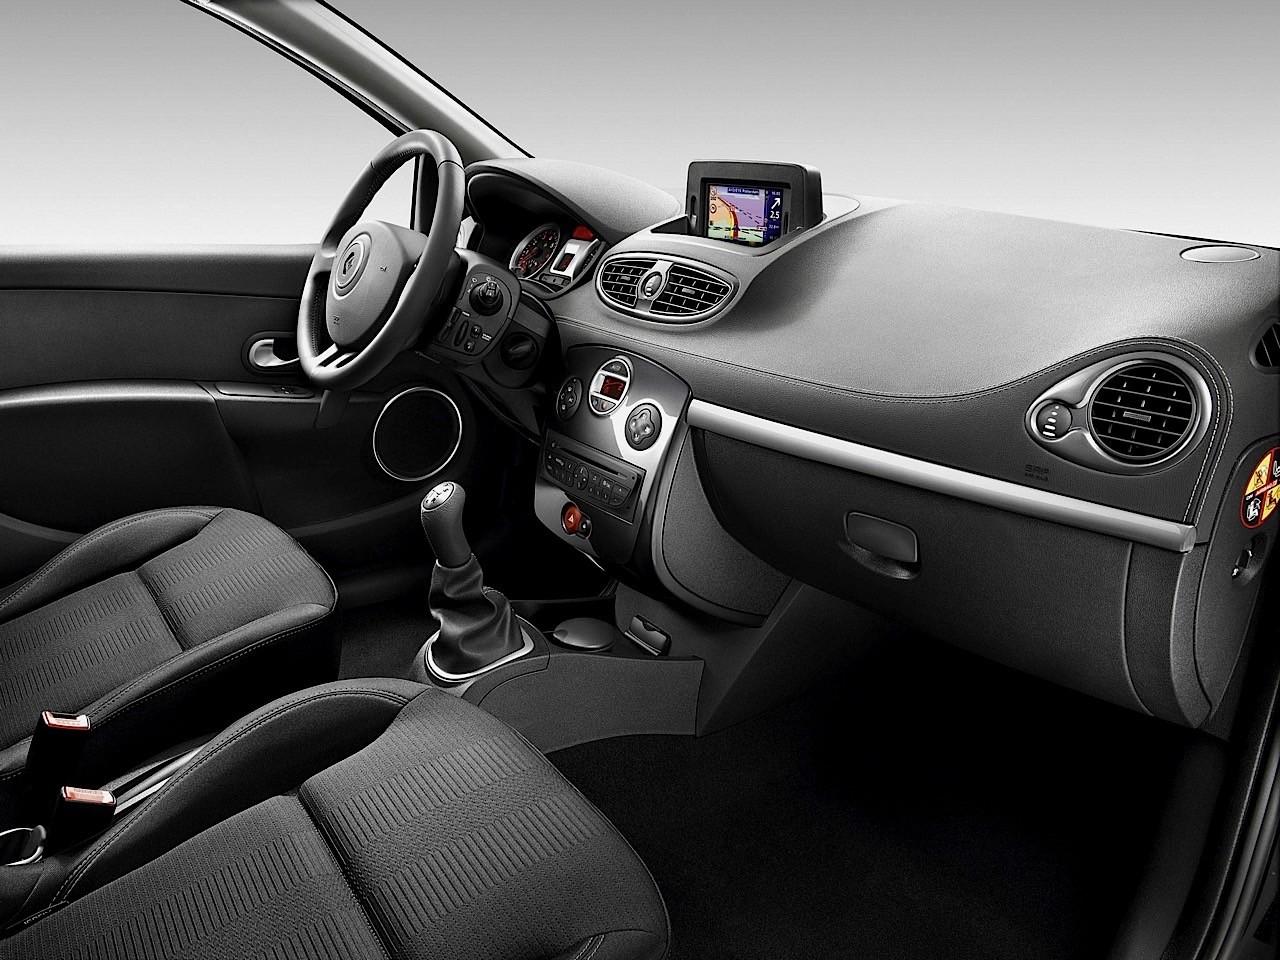 Renault Clio 5 Doors Specs Photos 2009 2010 2011 2012